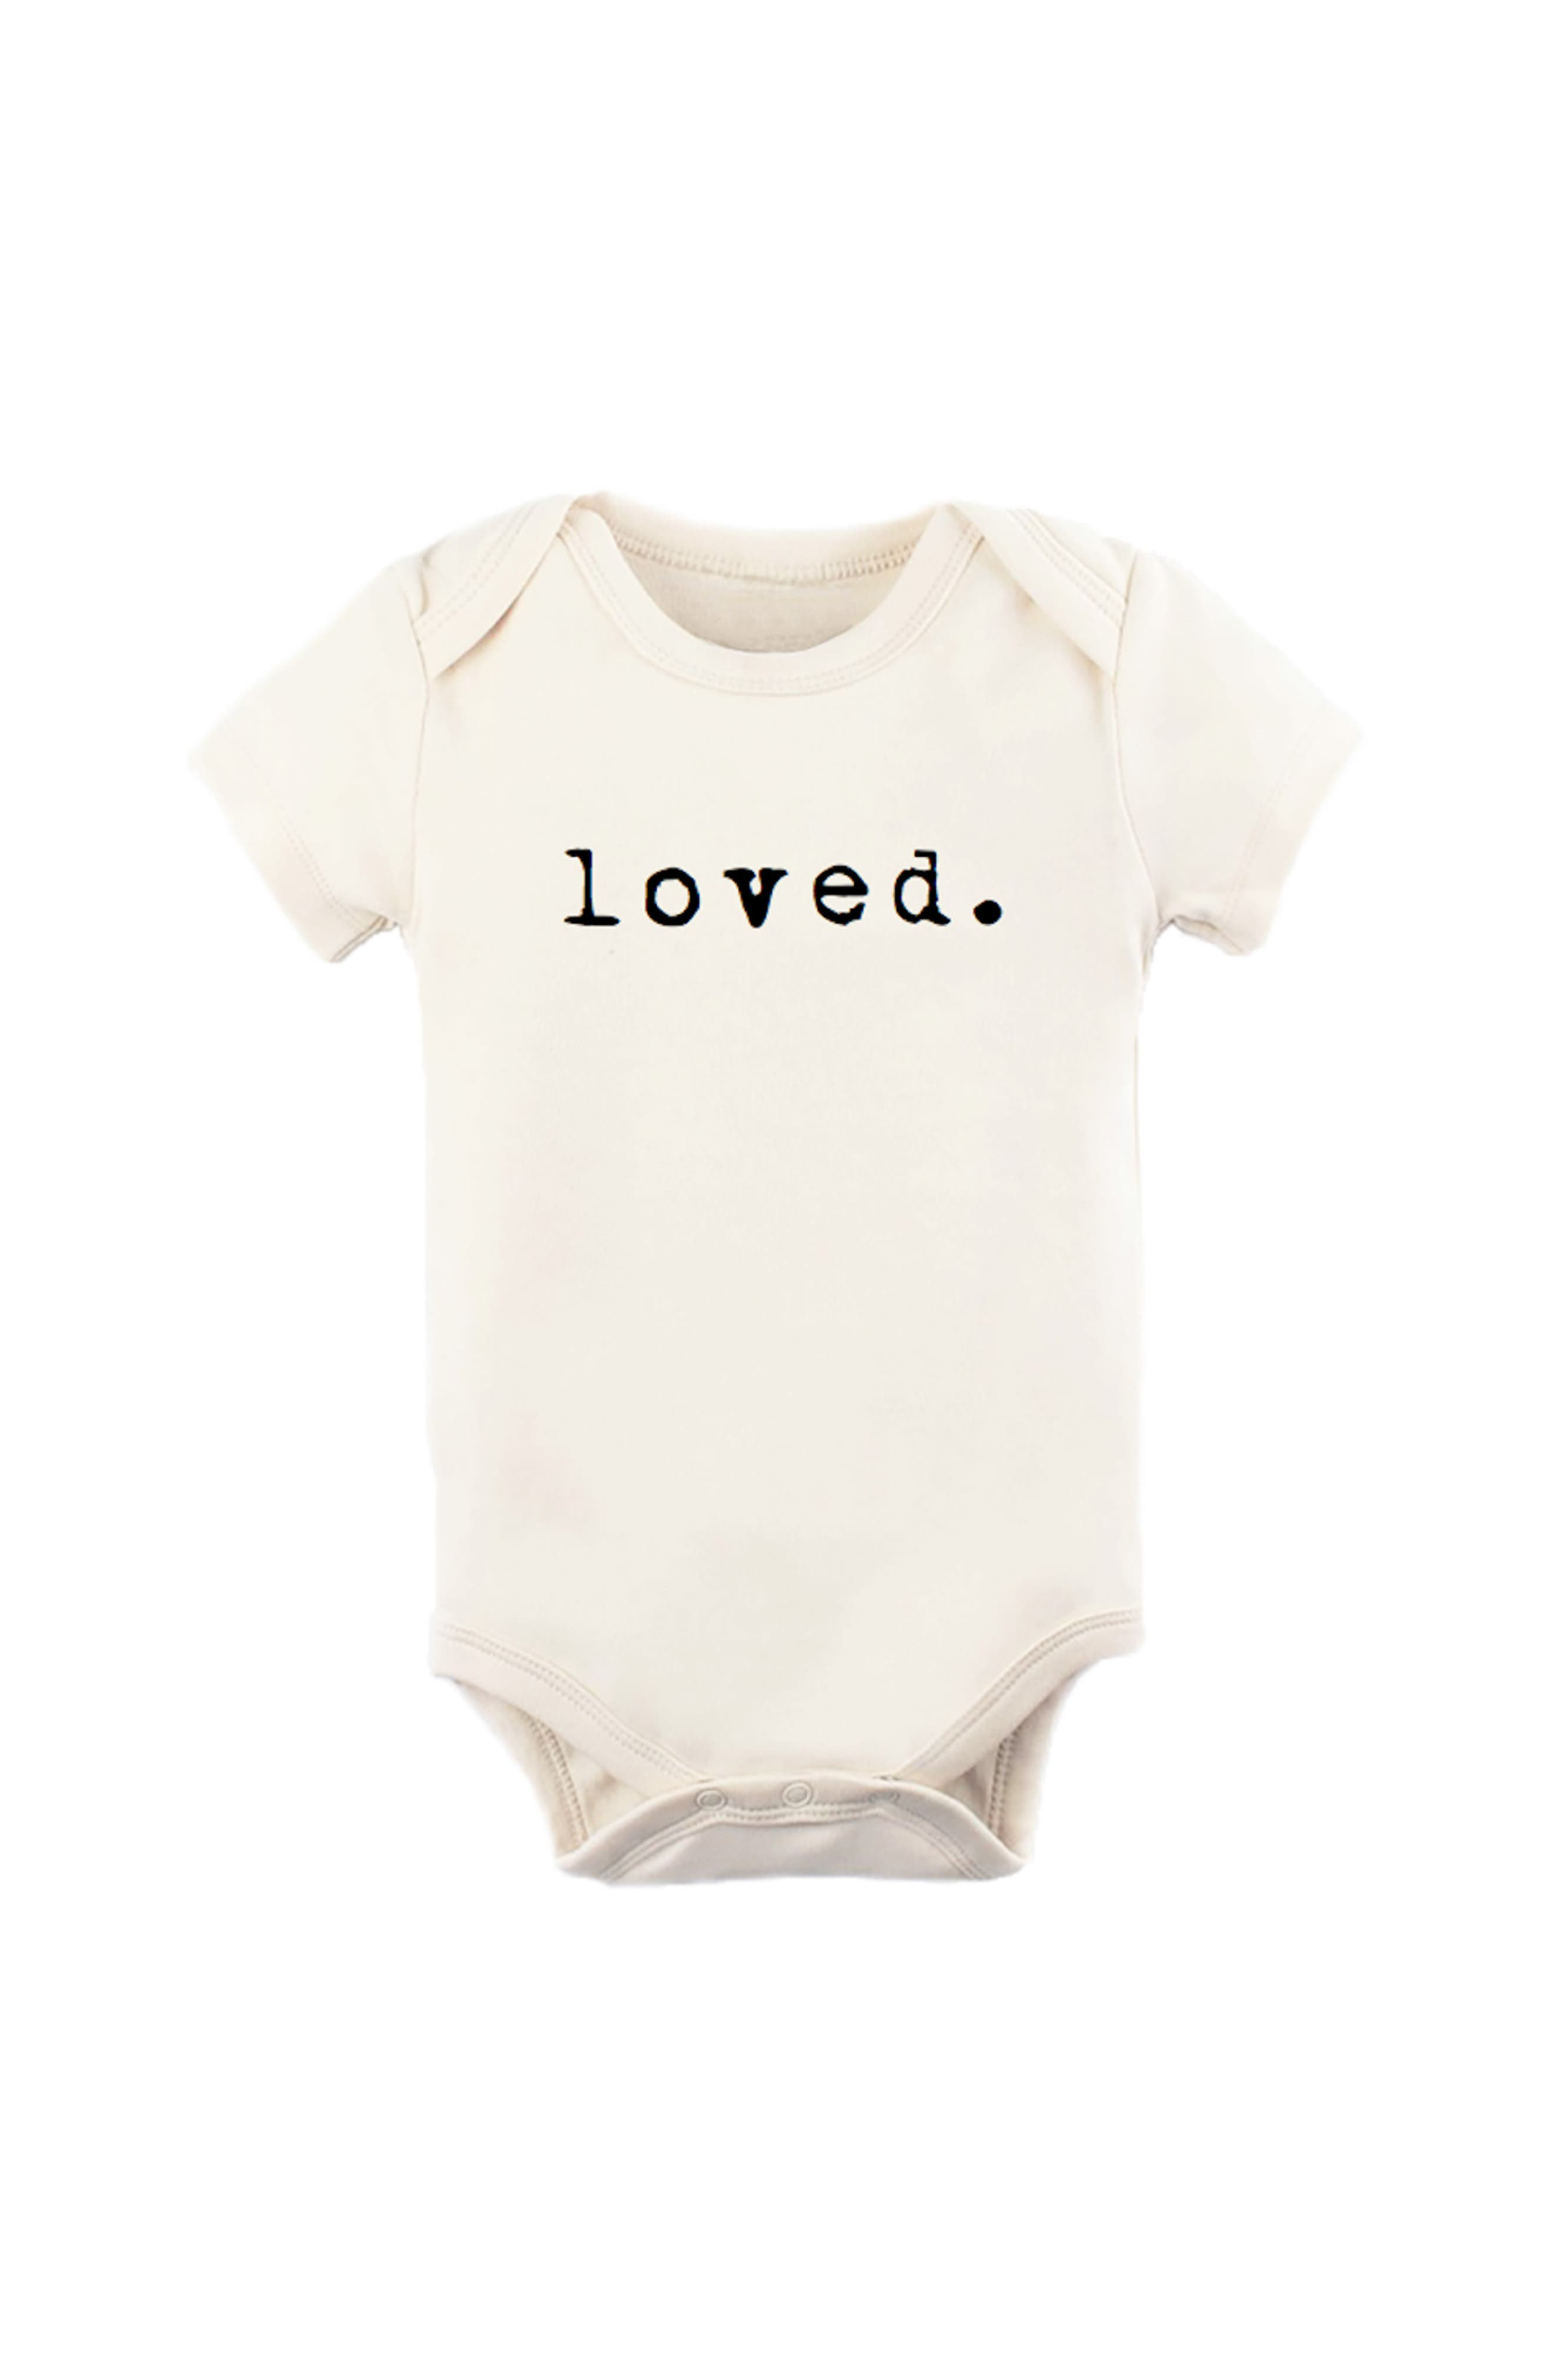 Loved Baby Newborn Outfit Trendy Baby Loved Gift For Baby Cute Baby Onesie Infant Onesie Loved Baby Baby Shower Gift Raglan Onesie